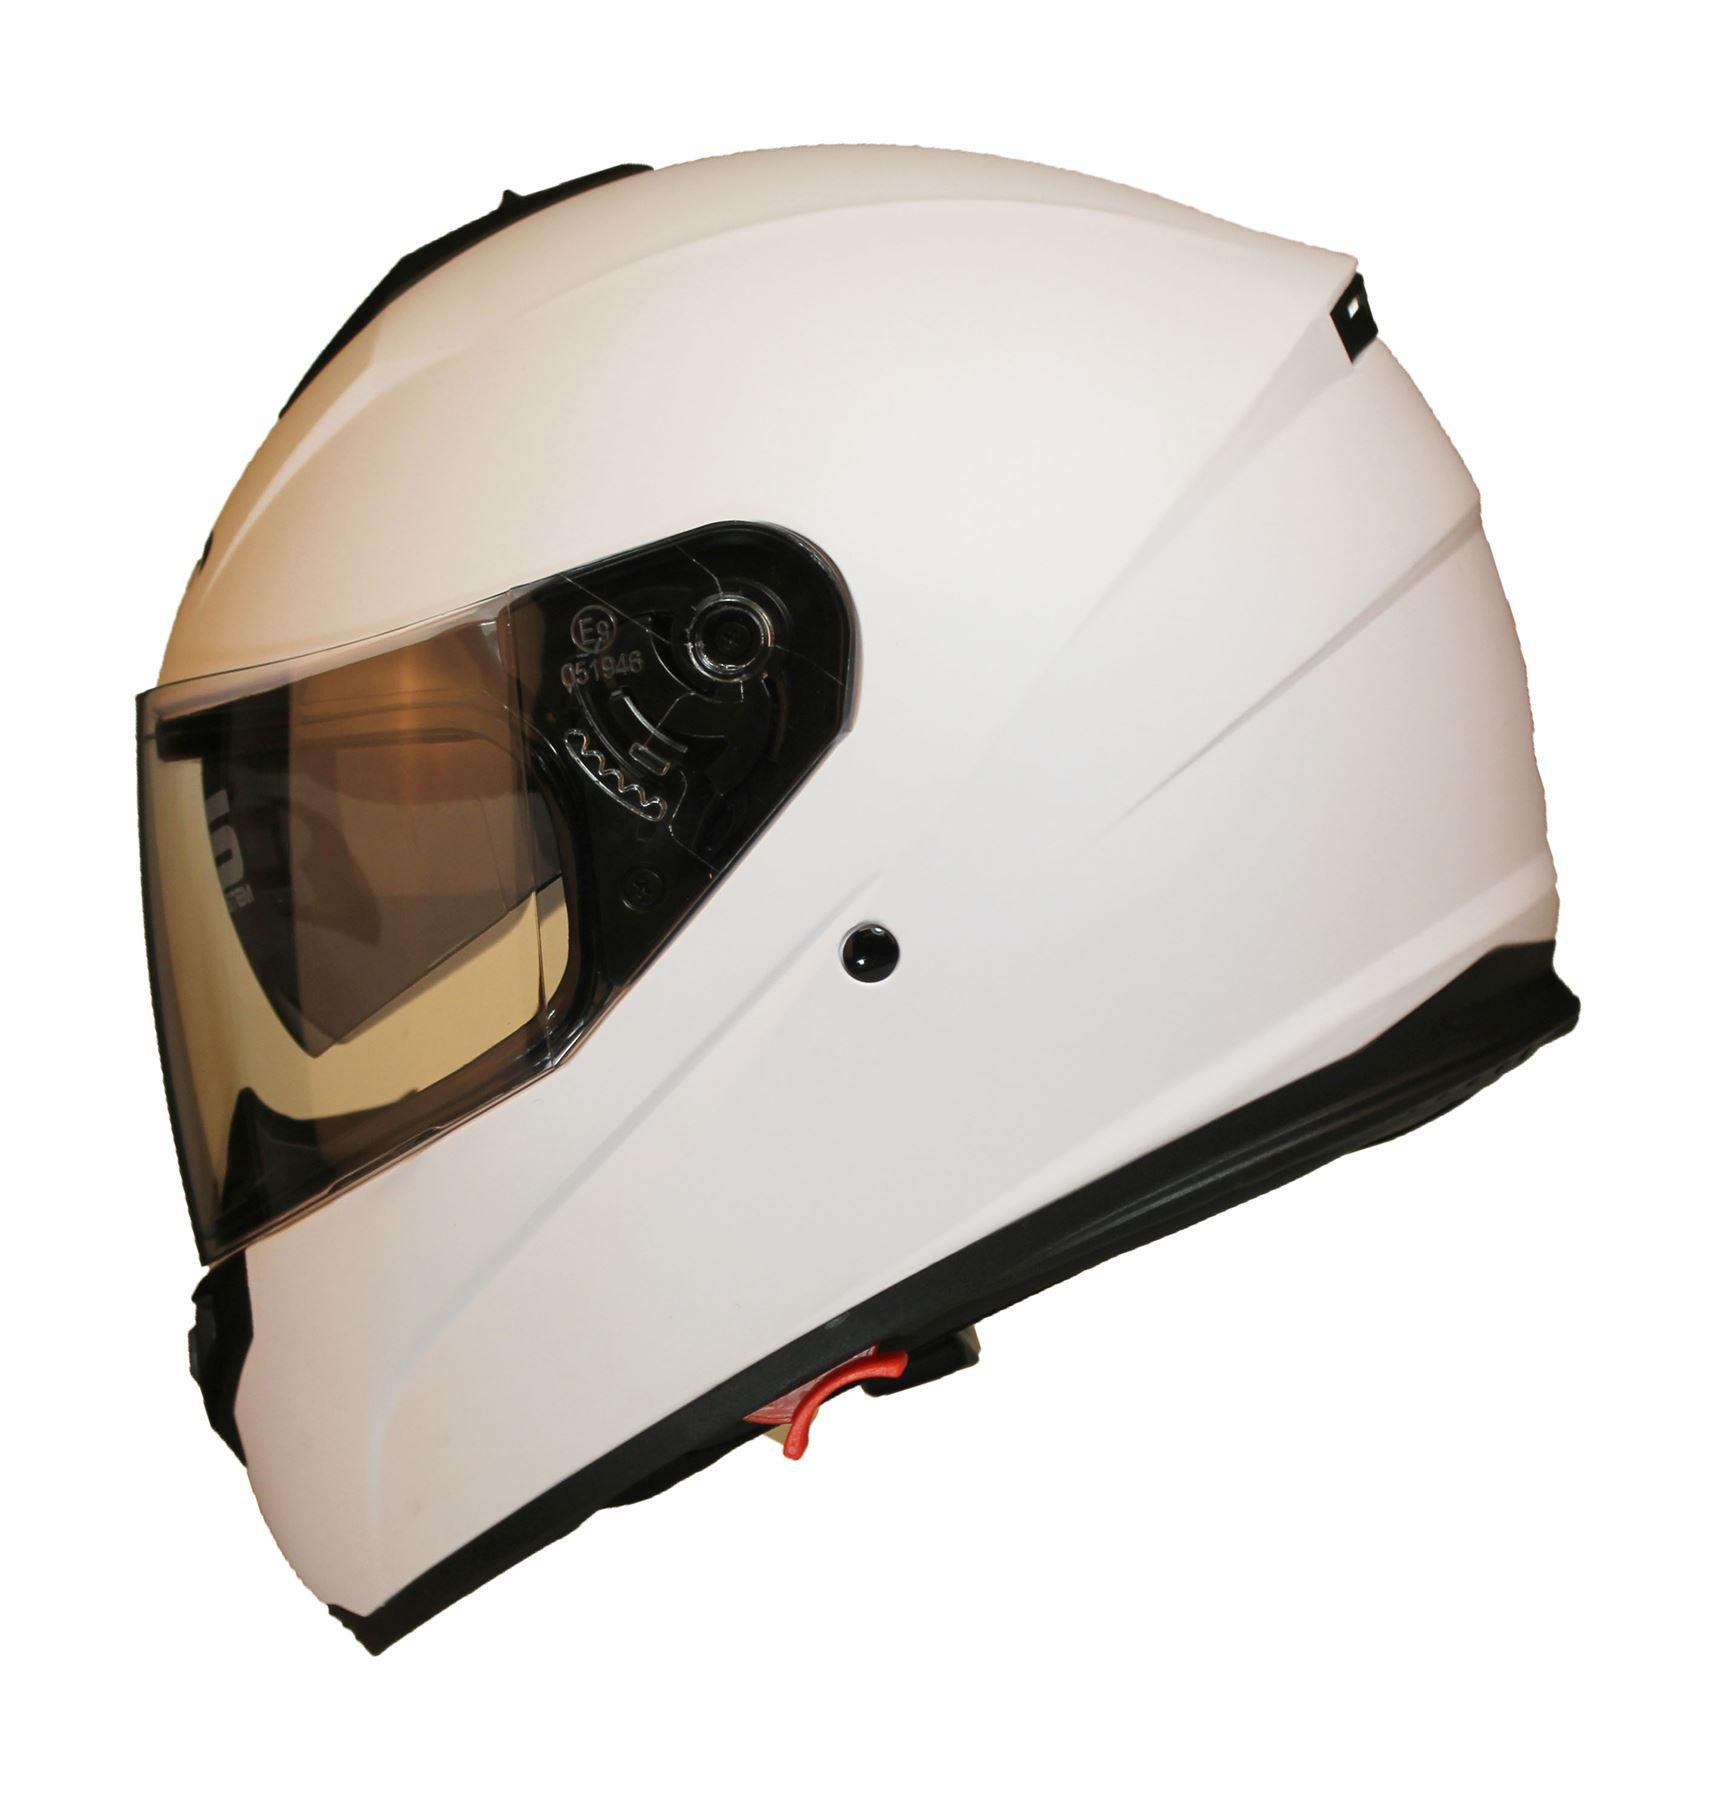 casque int gral double visi re moto scooter motard juridique route pare soleil ebay. Black Bedroom Furniture Sets. Home Design Ideas